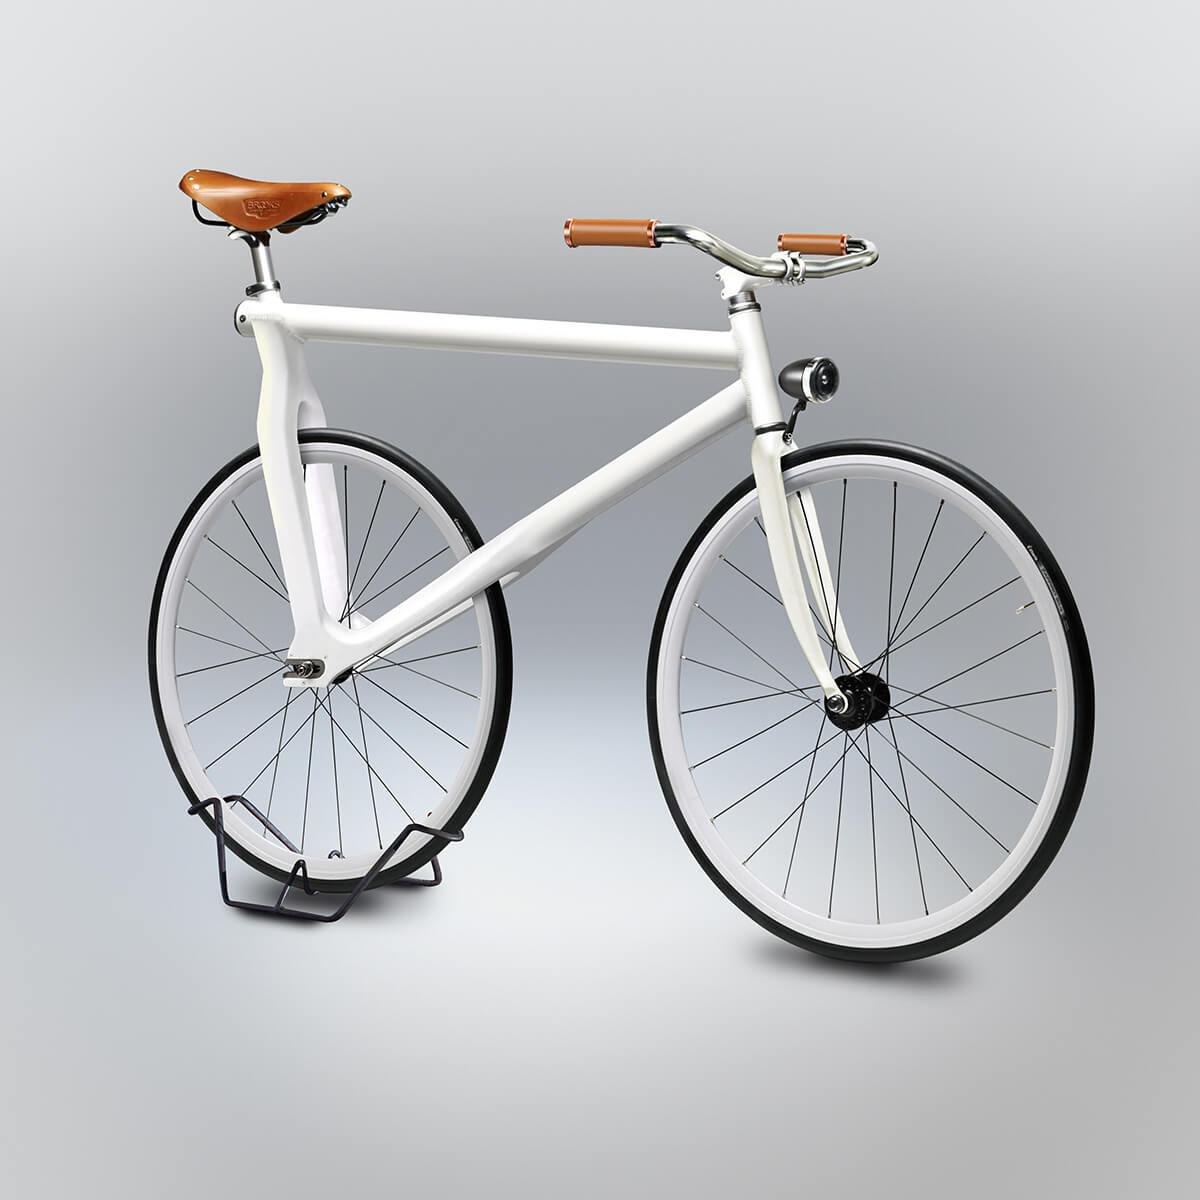 gianluca-gimini-bikes-4